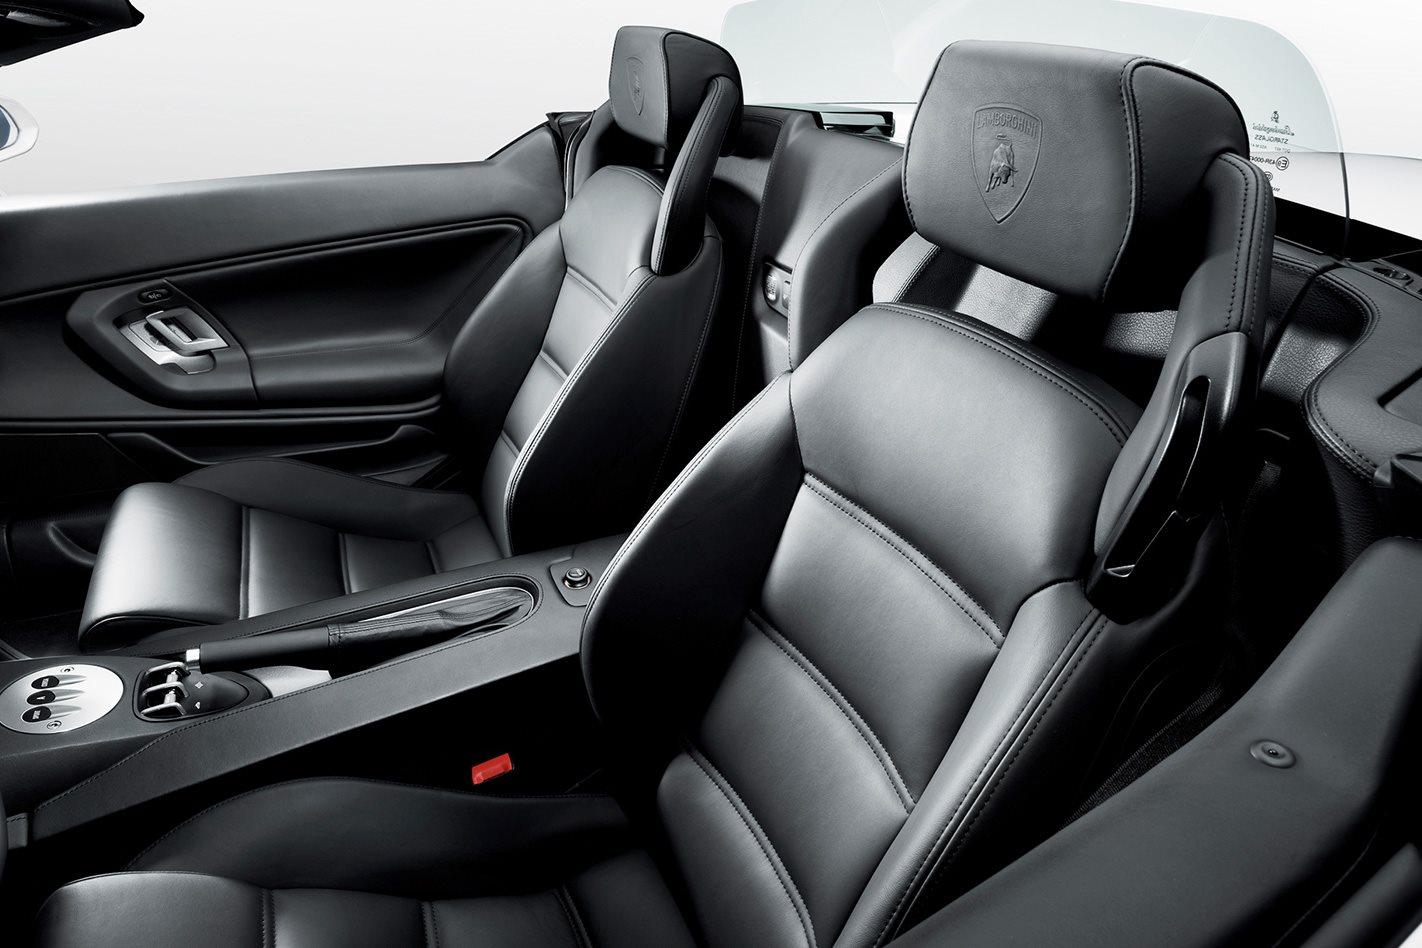 Lamborghini Gallardo Spyder interior